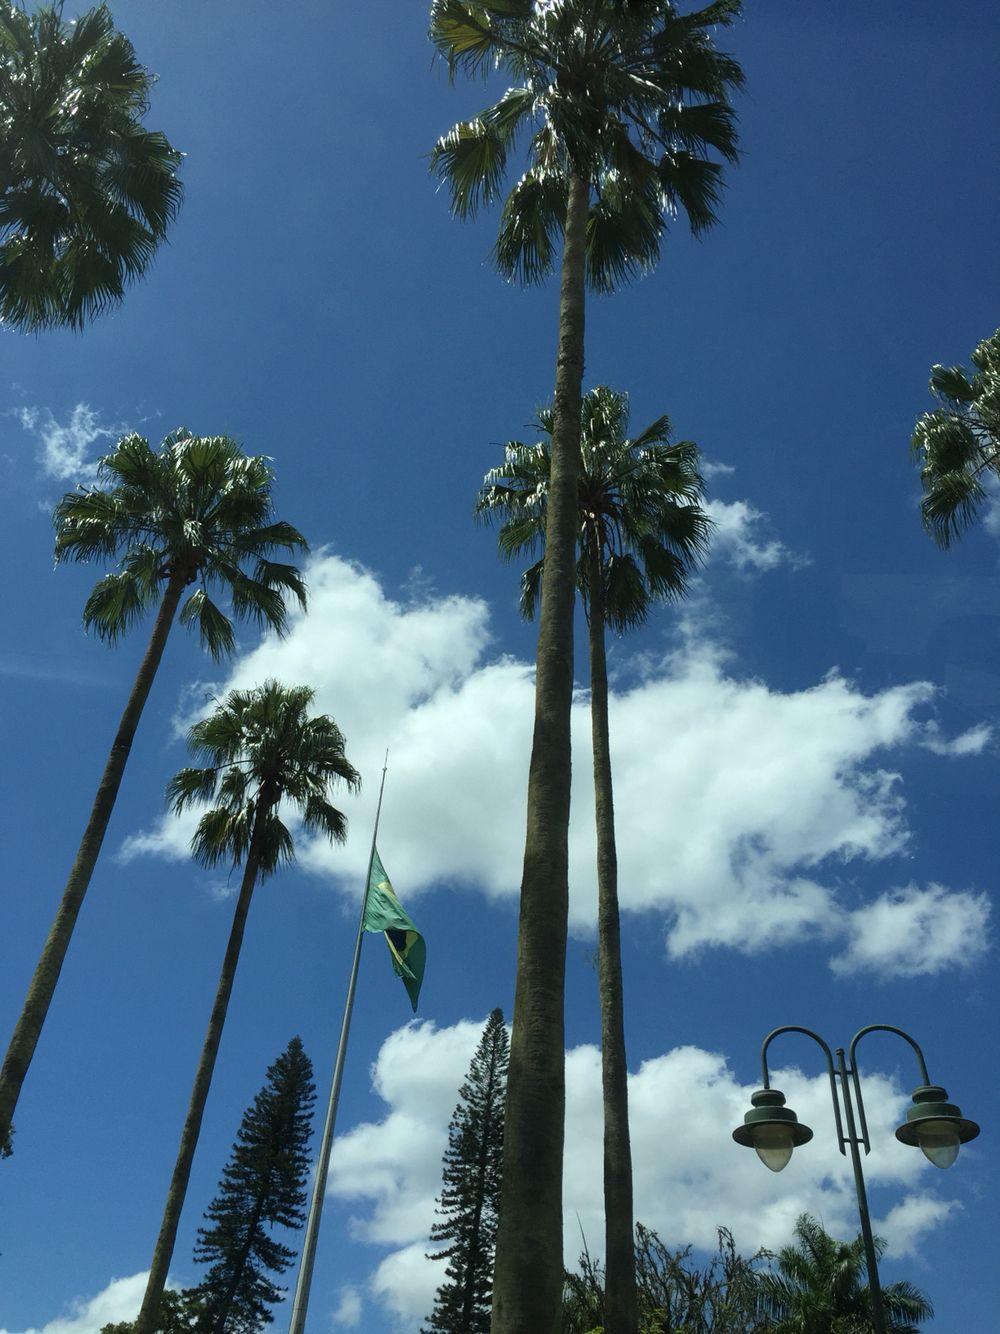 Praça da bandeira - Joinville - SC